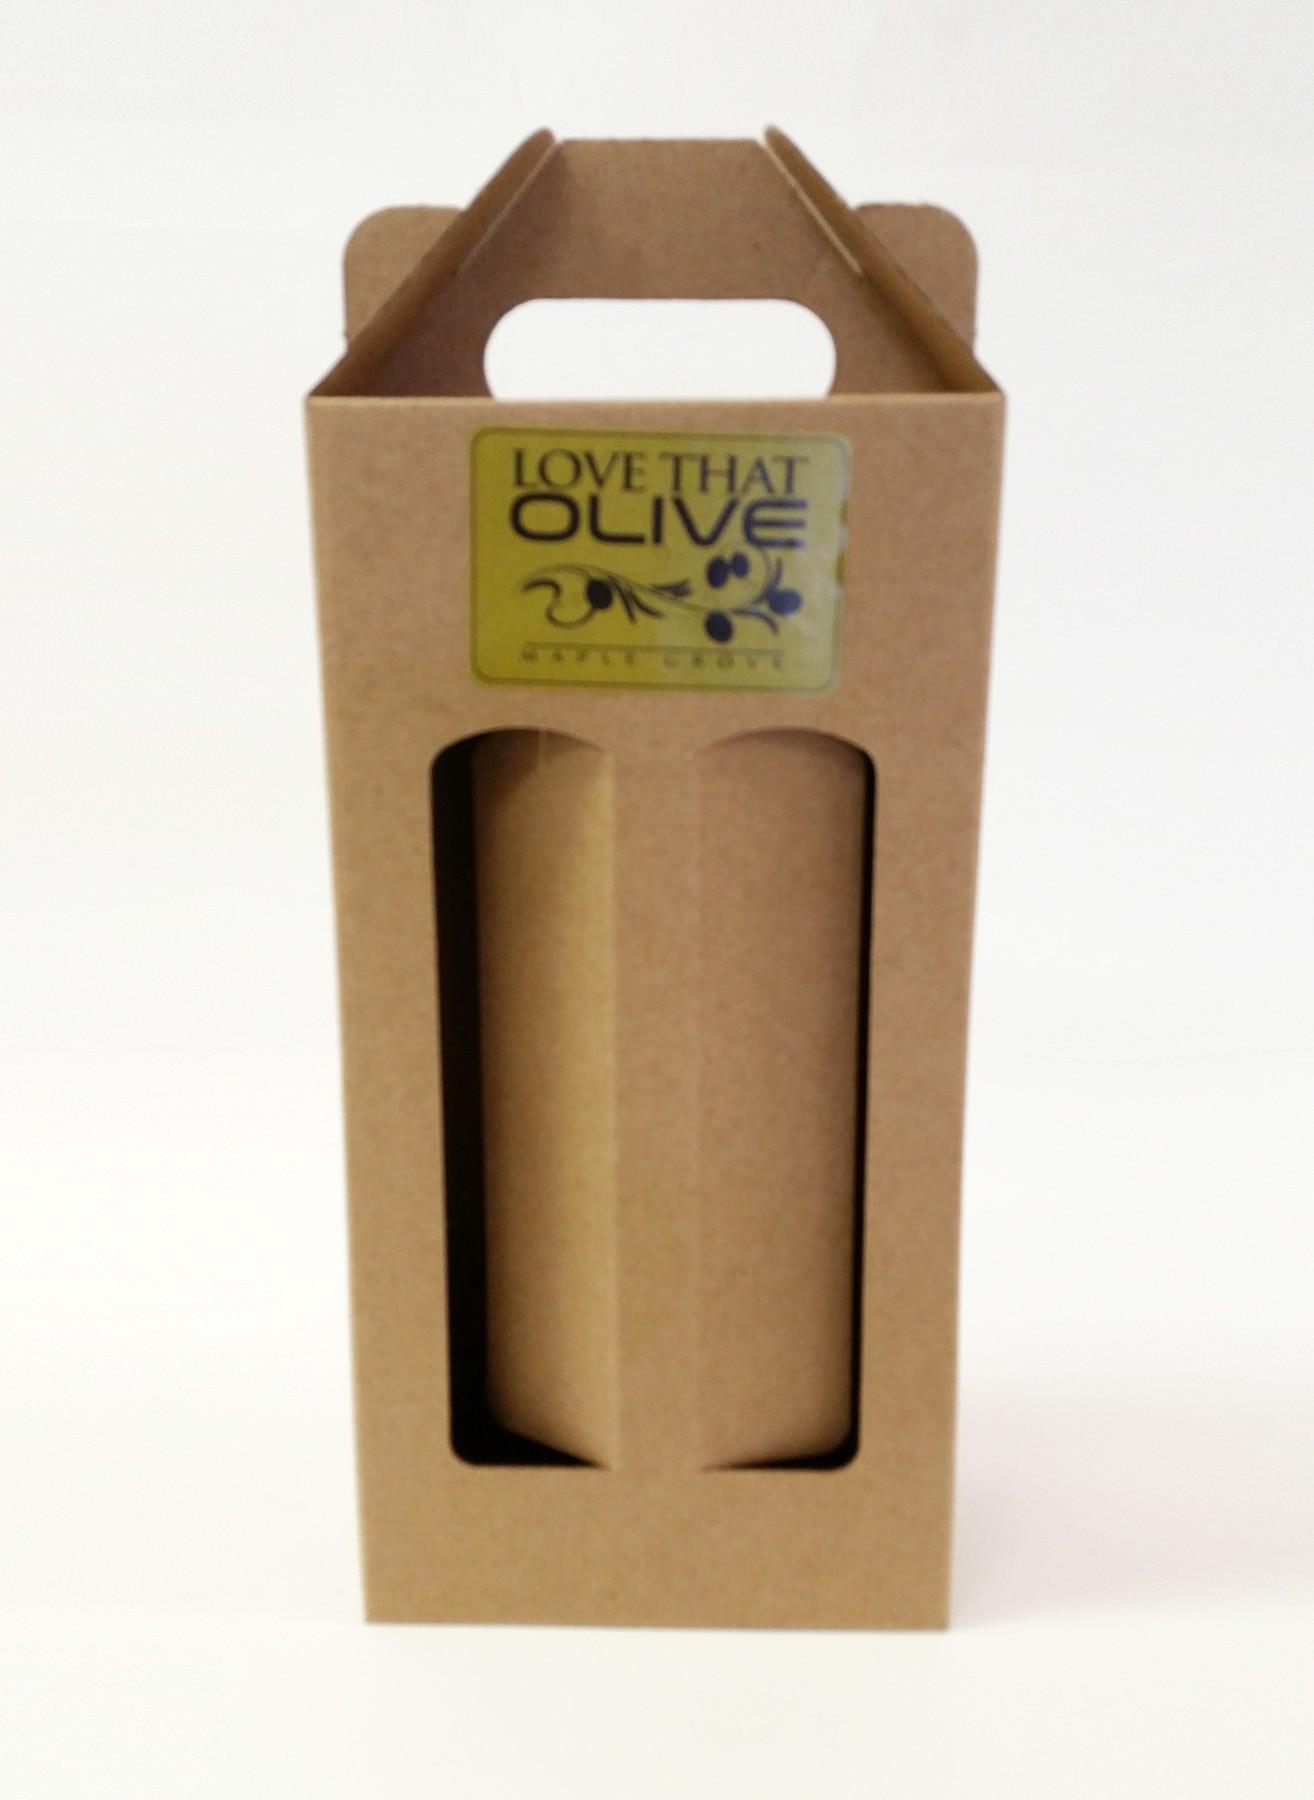 Two-Bottle Gift Box in Kraft Brown